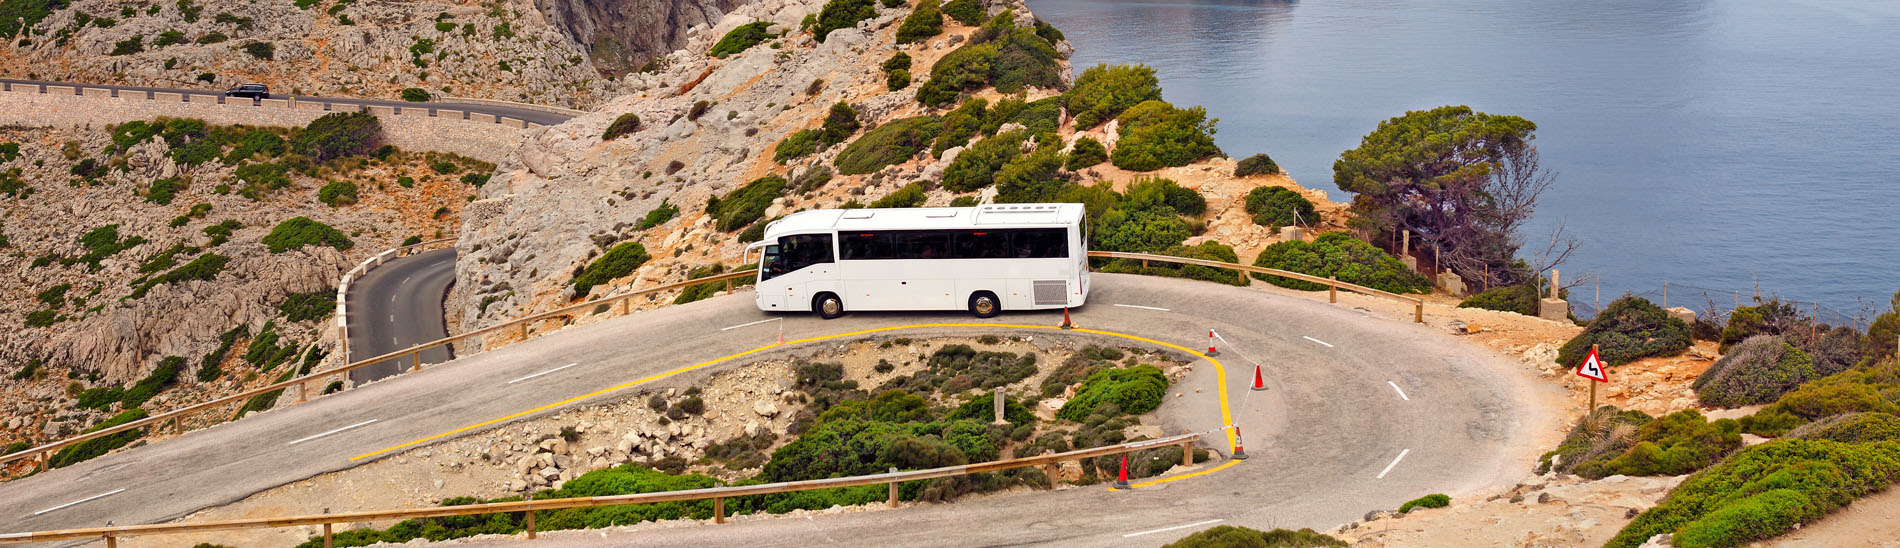 Abogados para solicitar indemnización por accidentes en transporte público